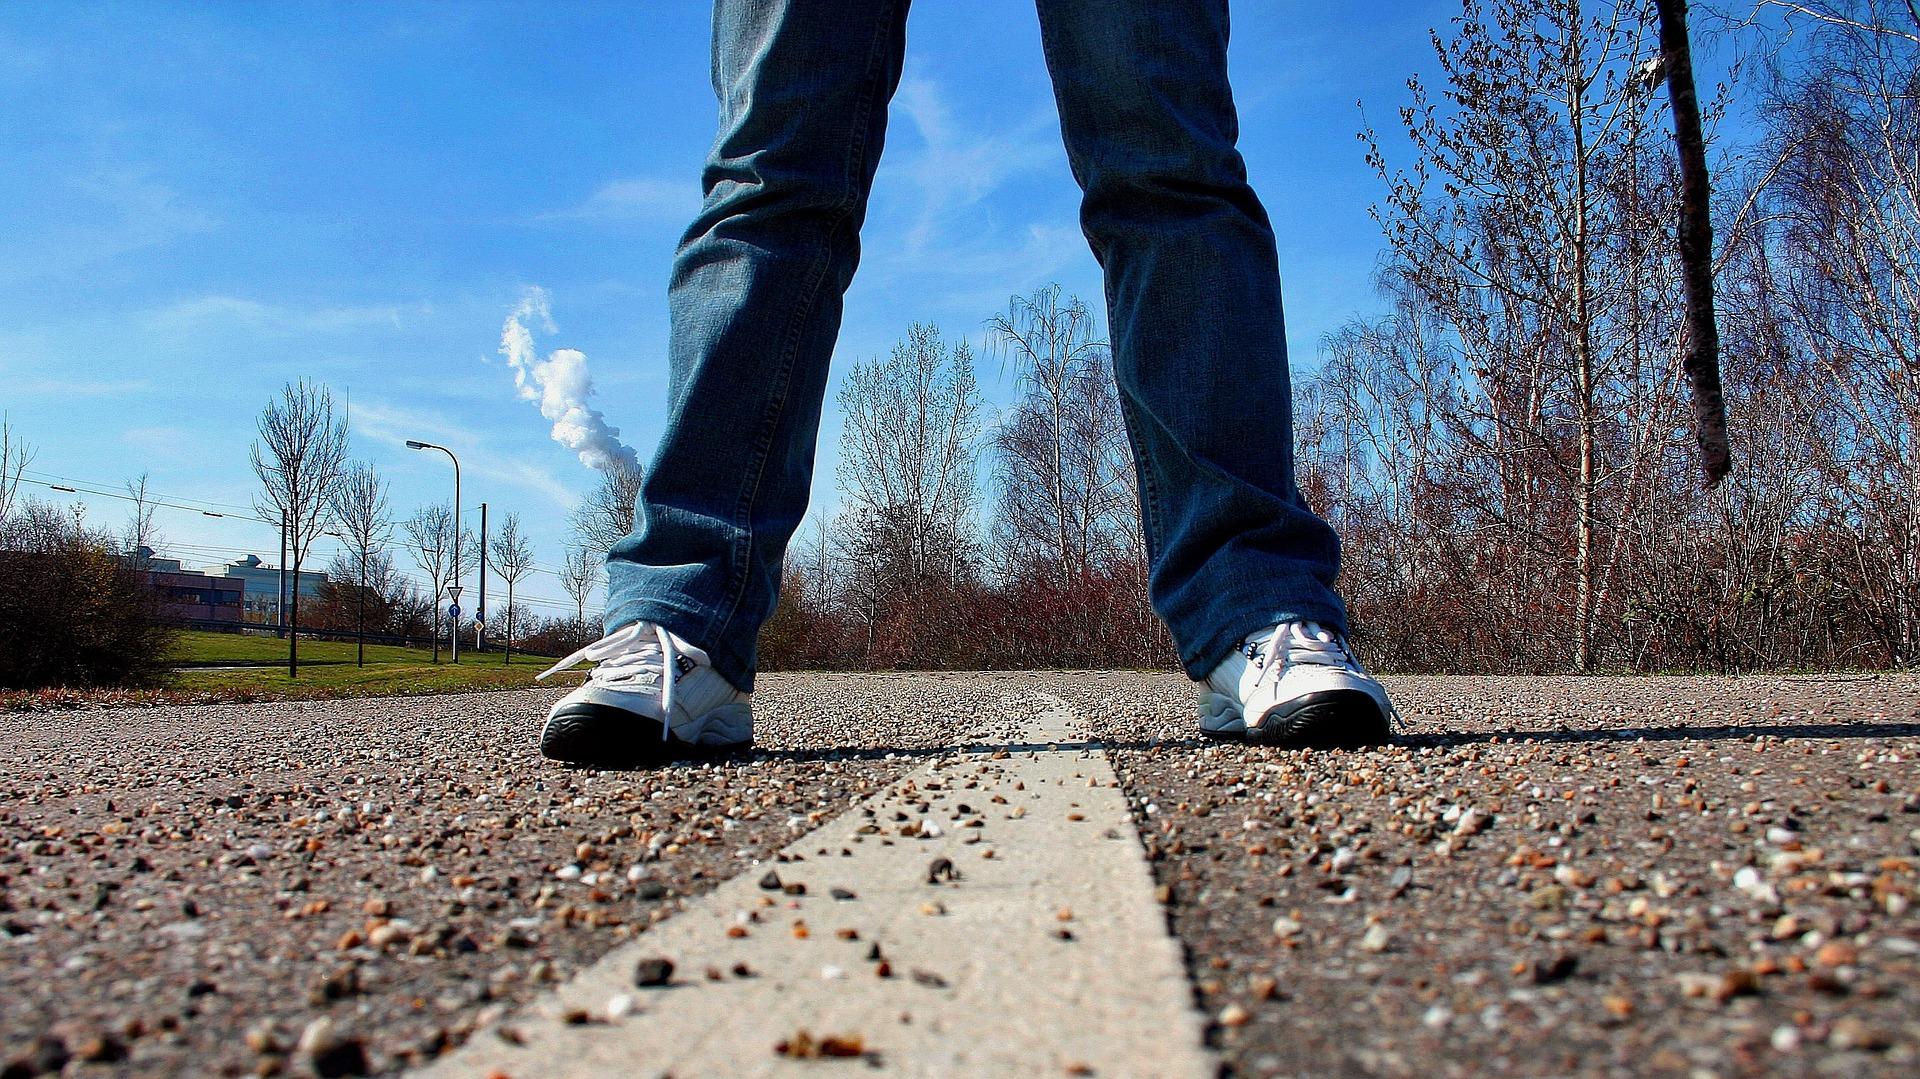 sidewalk-657906_1920 Unknown Road